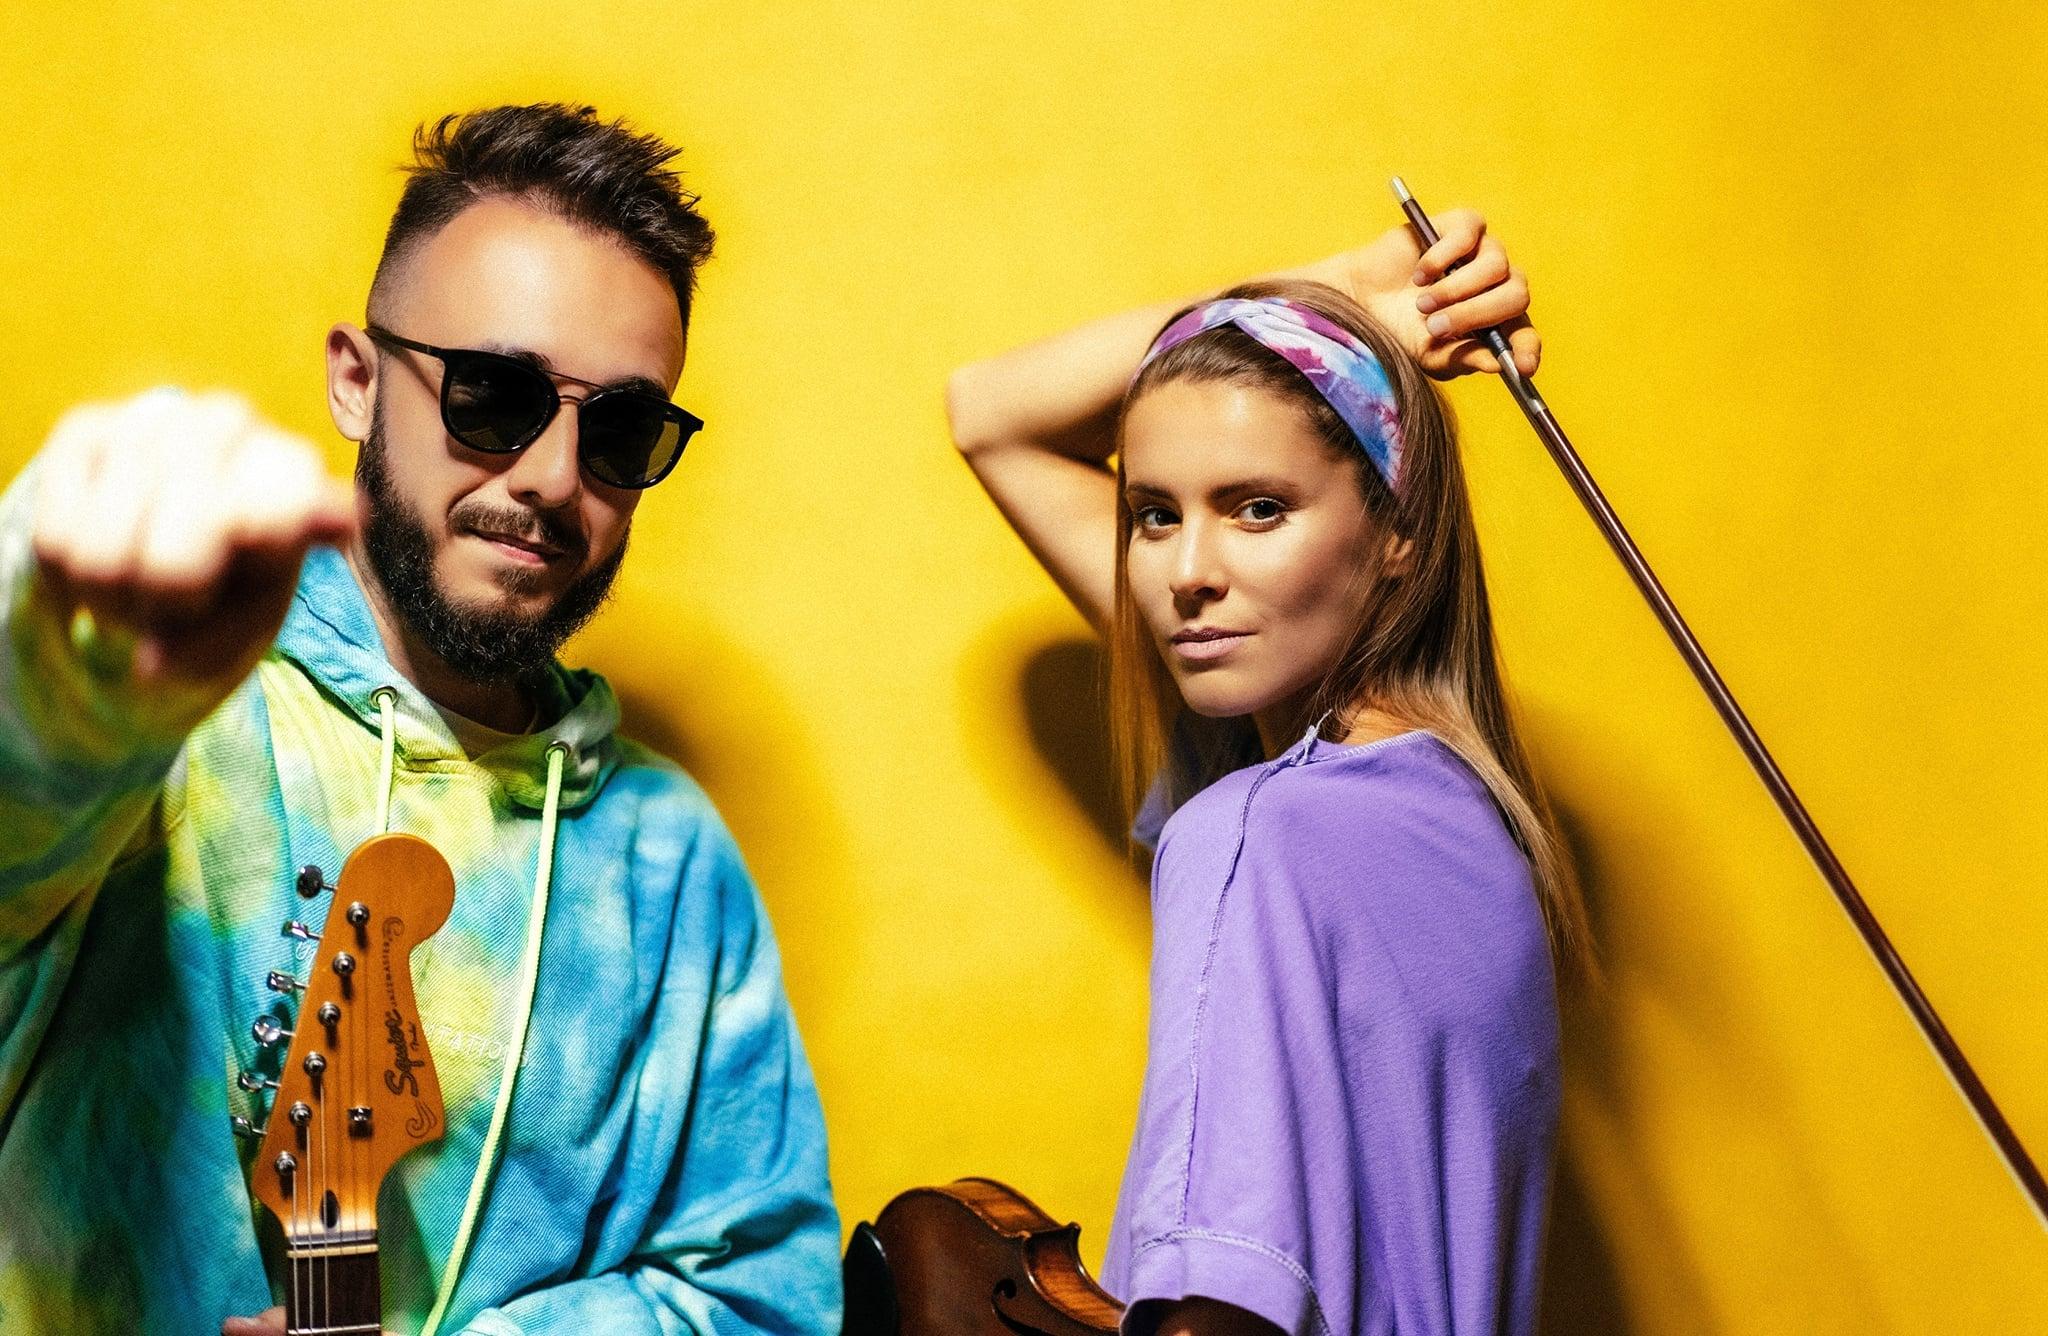 Martin Brečko & Victoria Linnen – Dance Monkey